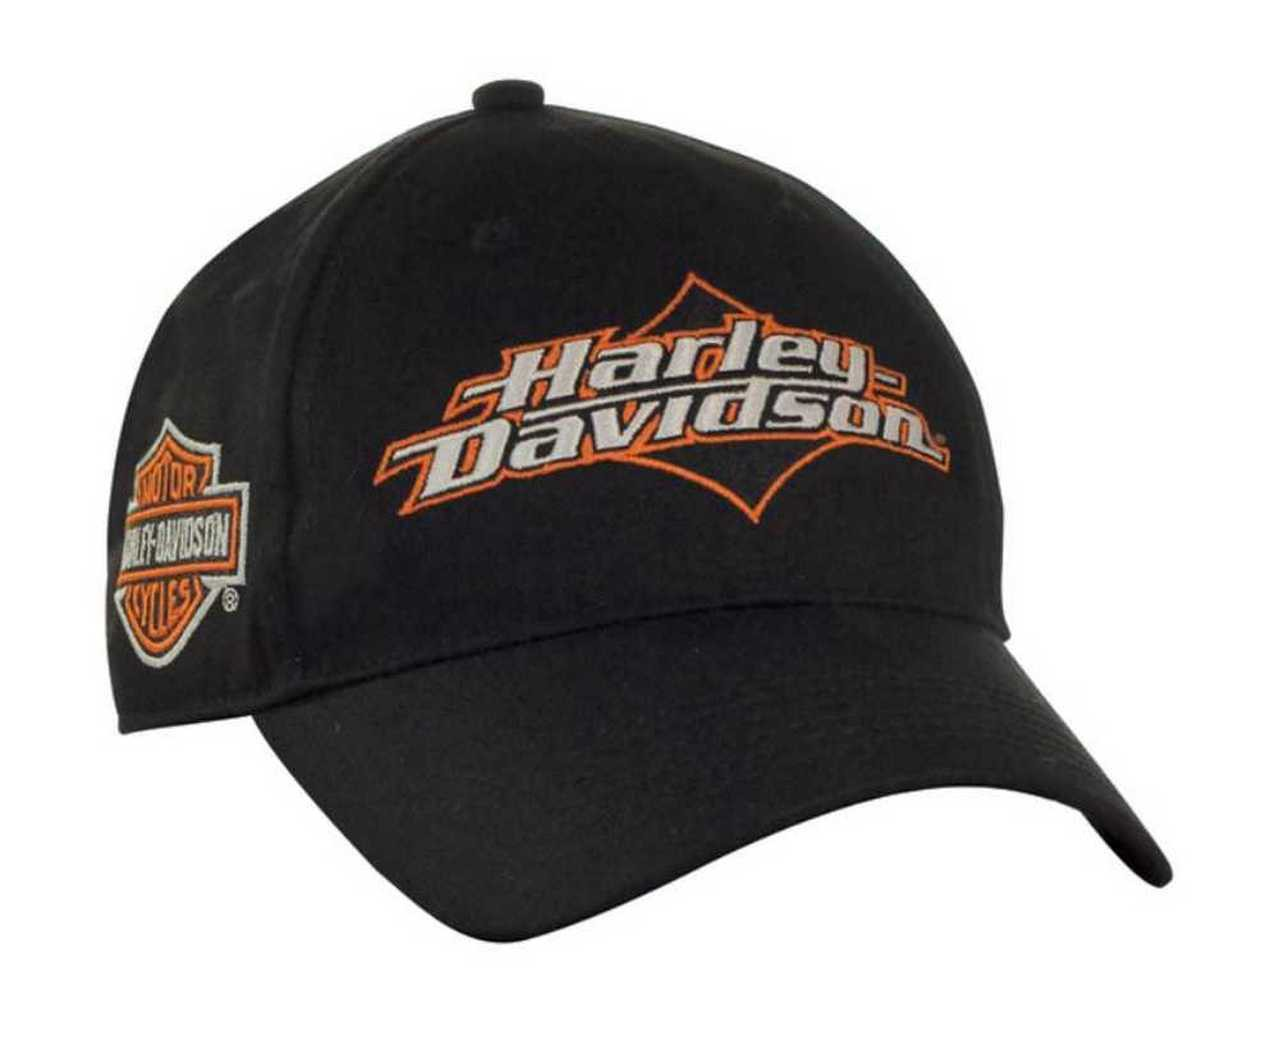 harley davidson cap bar ride shield joy baseball beanie knit mens hats berretto scudo nero noir wisconsin